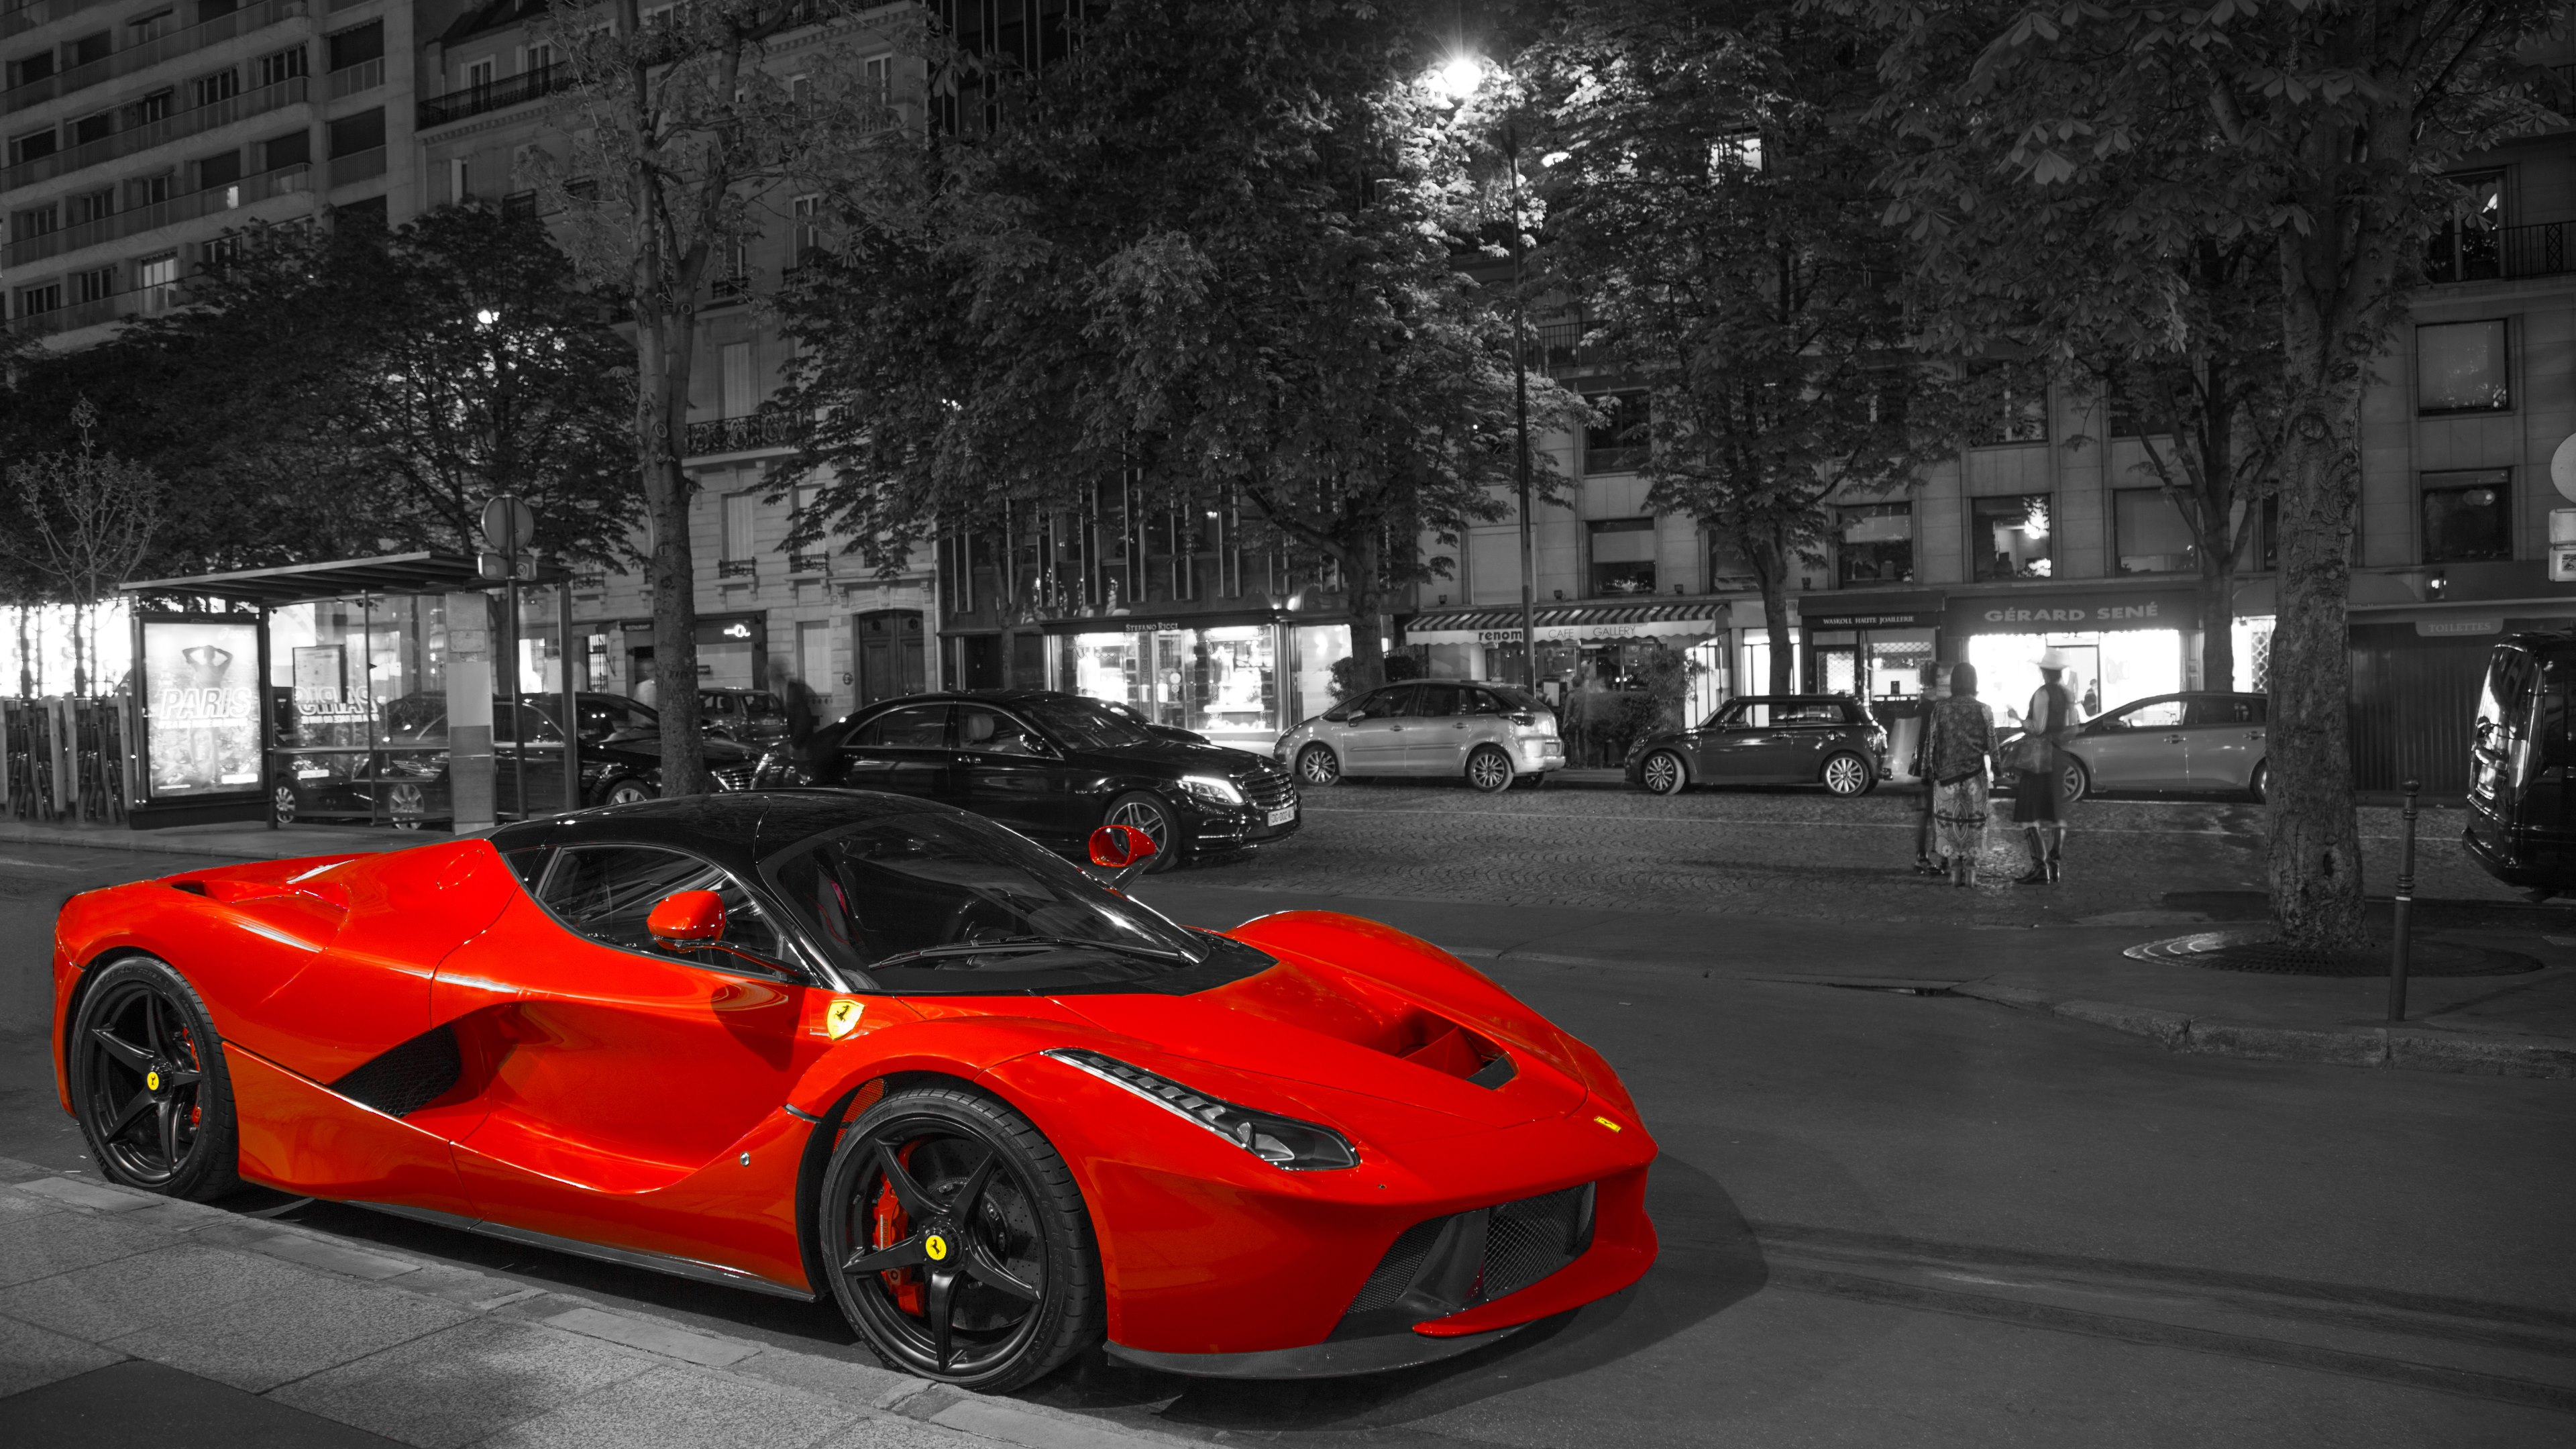 Super Red Car LaFerrari HD Wallpapers 4K Wallpapers 3840x2160